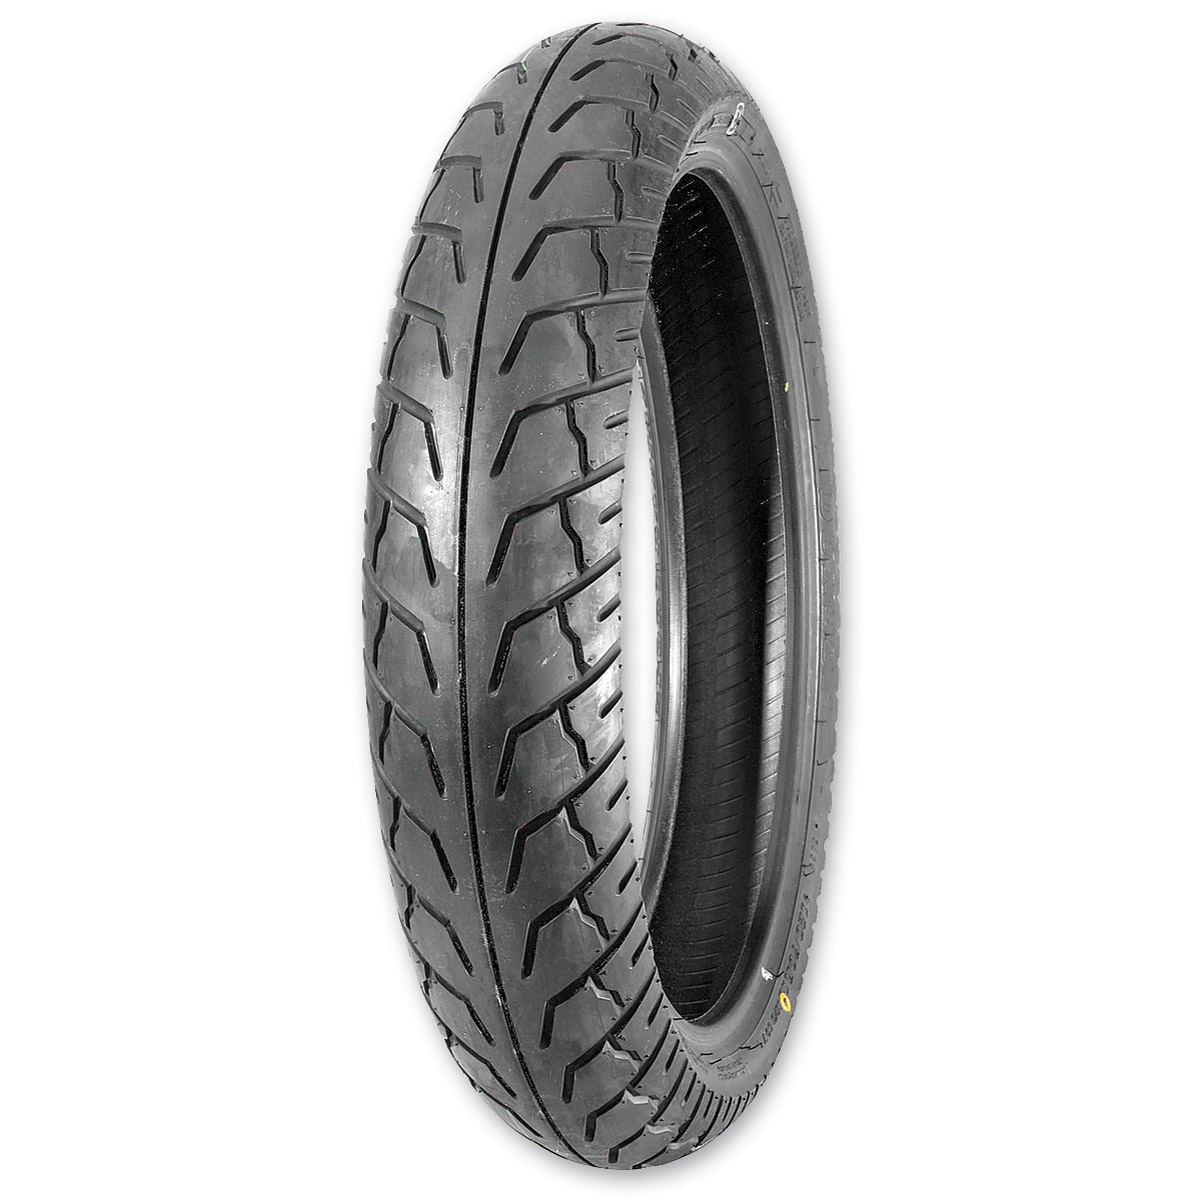 Dunlop K701F 120/70R18 Front Tire